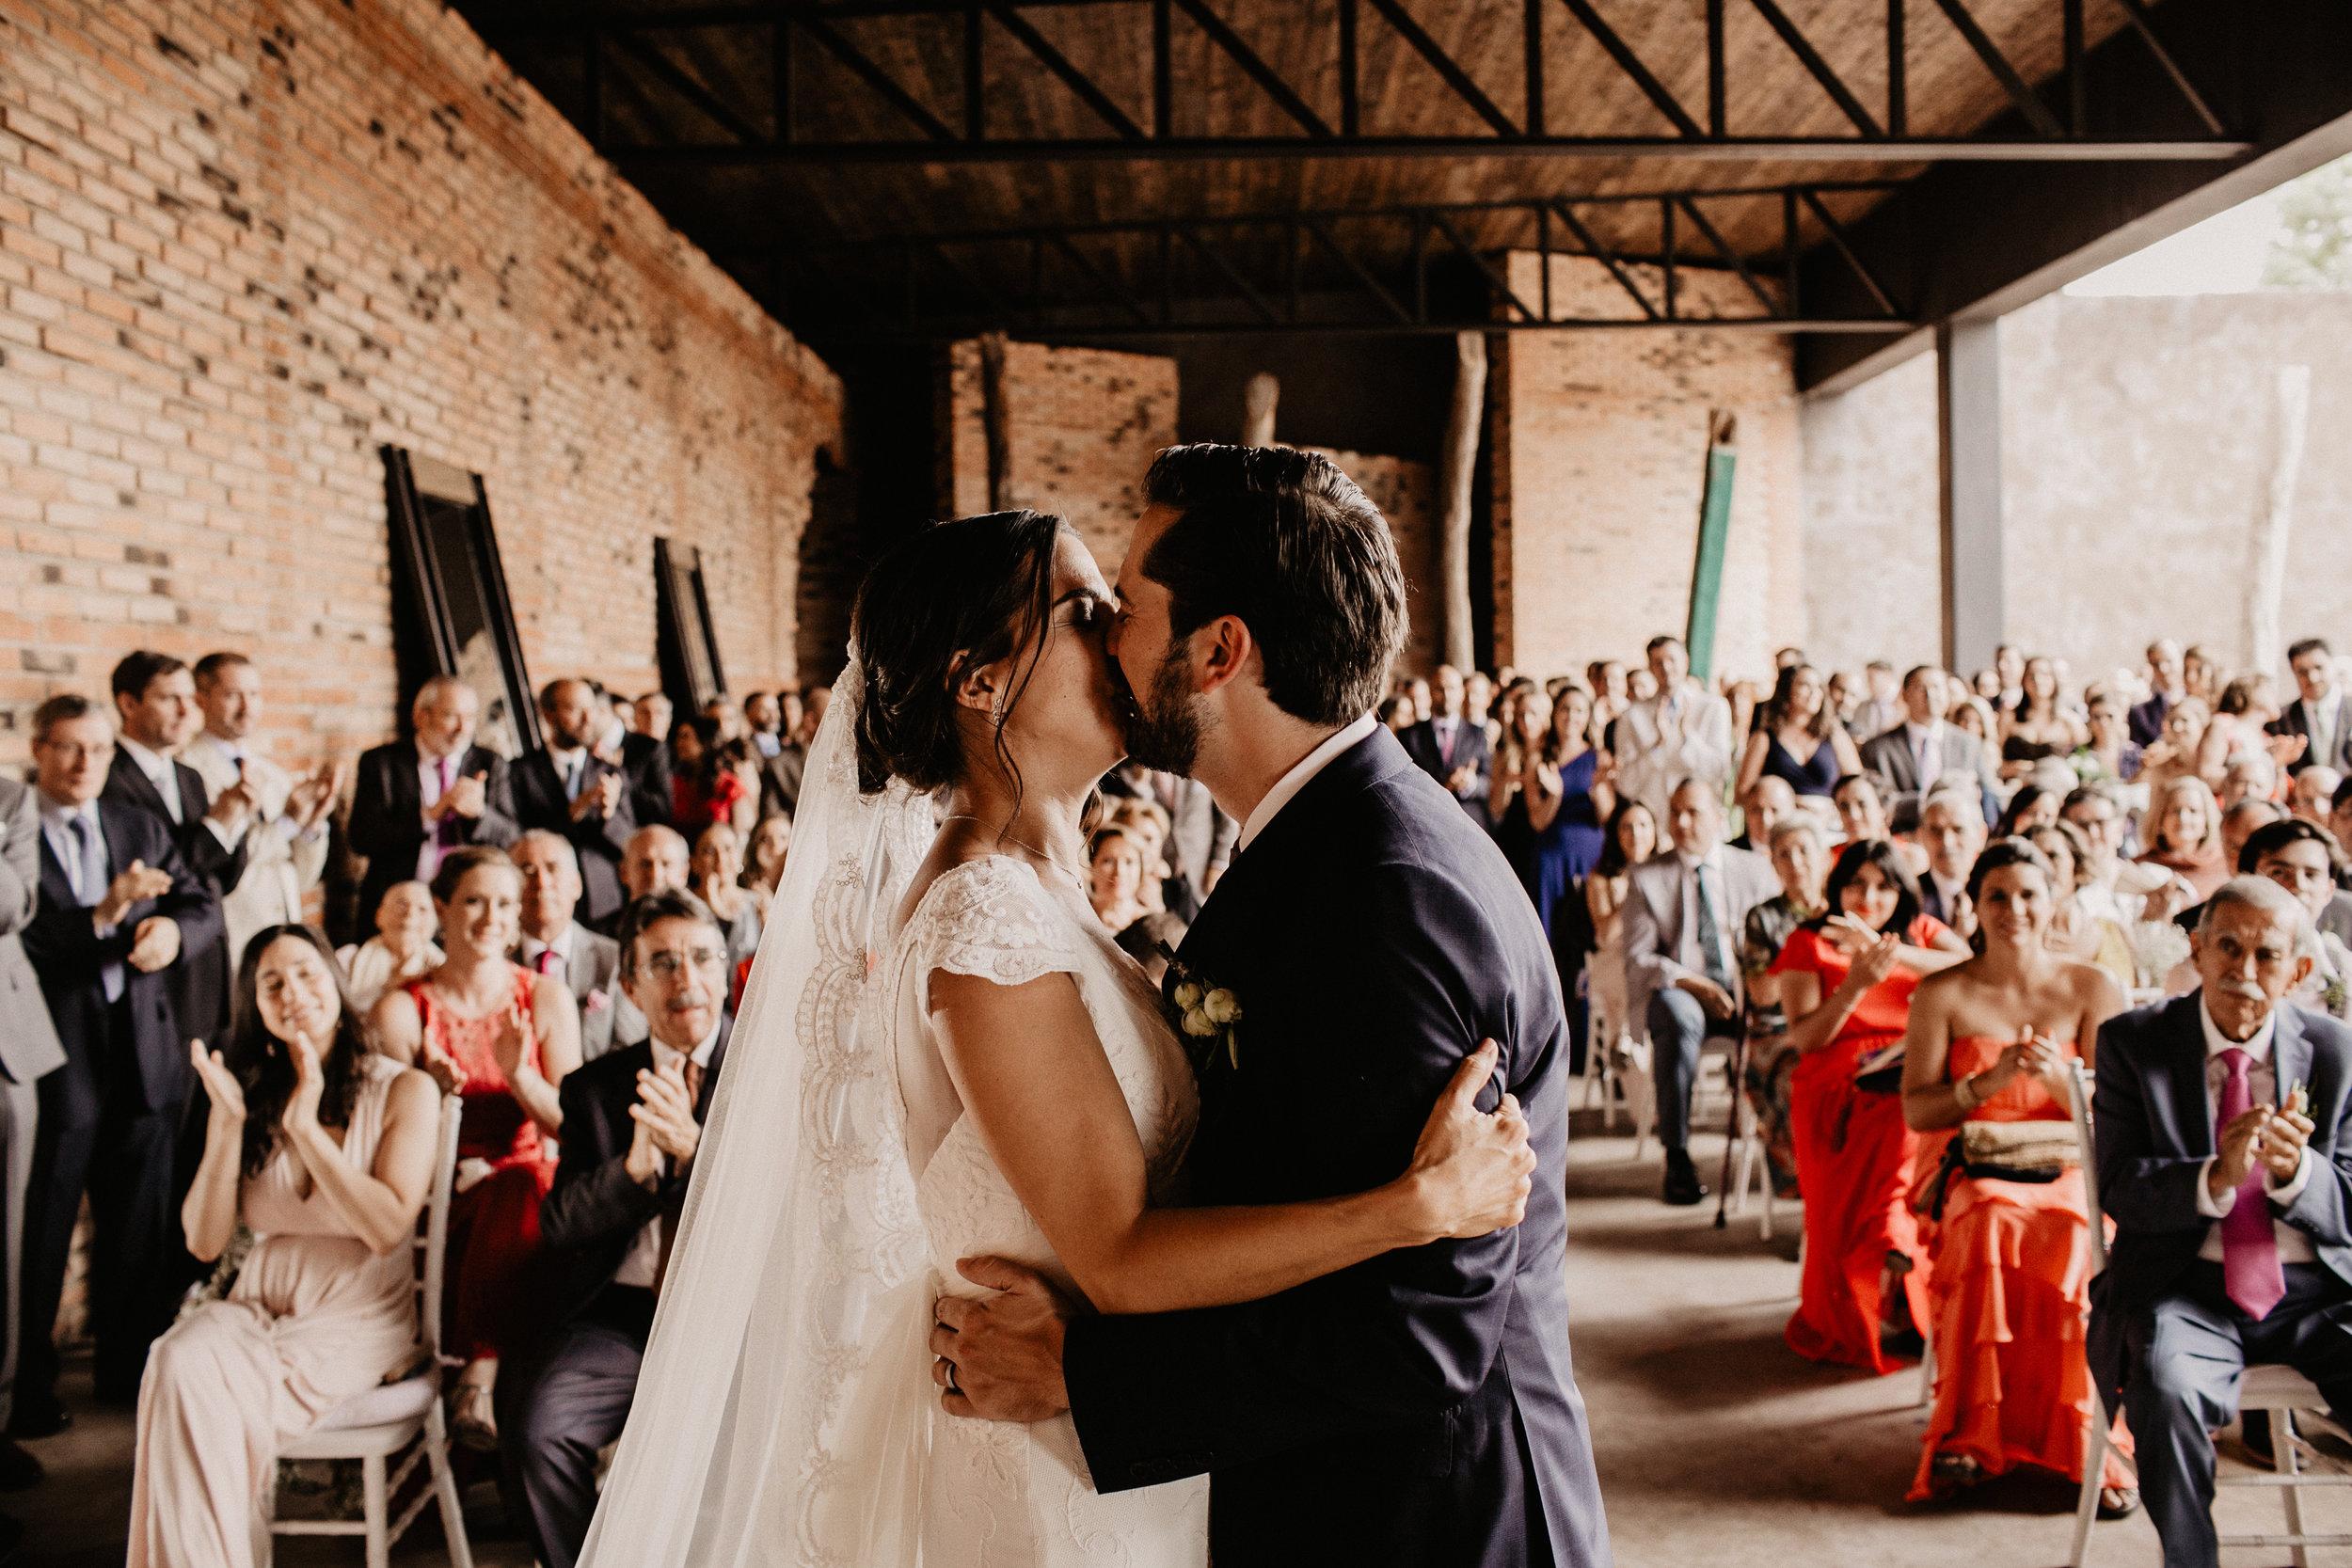 alfonso_flores_destination_wedding_photographer_pau_alonso_660.JPG